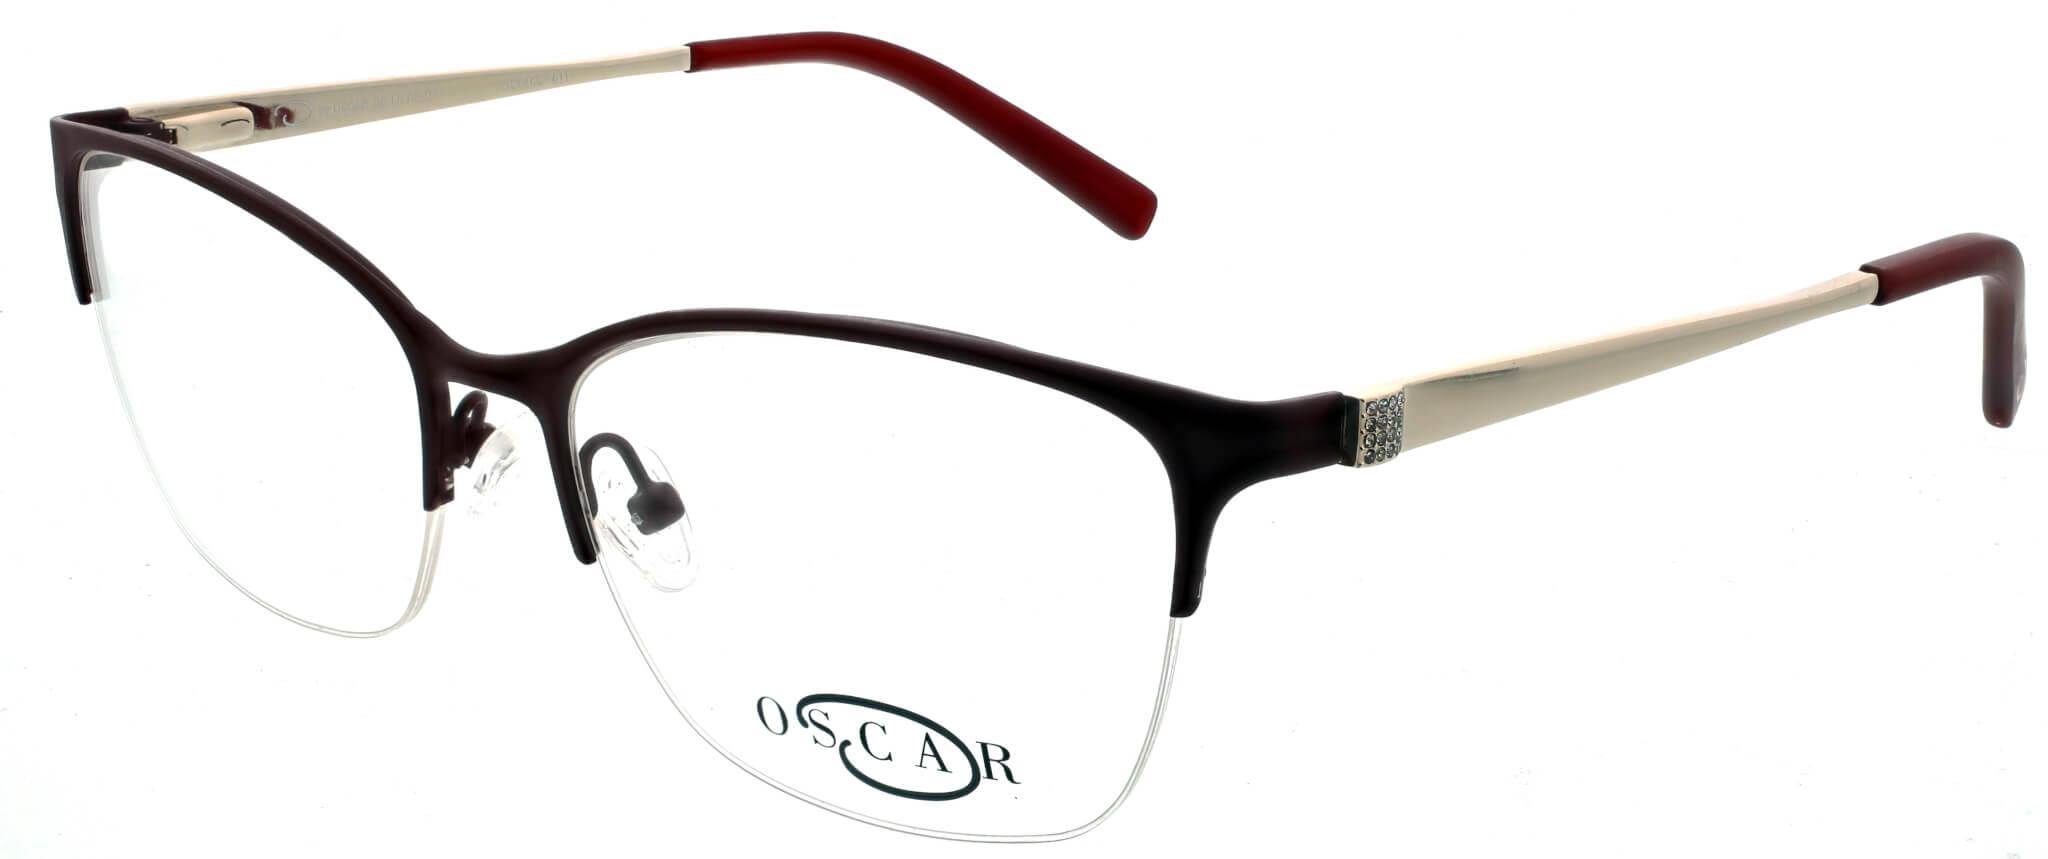 Oscar de la Renta thin round frame glasses with black trim and logo